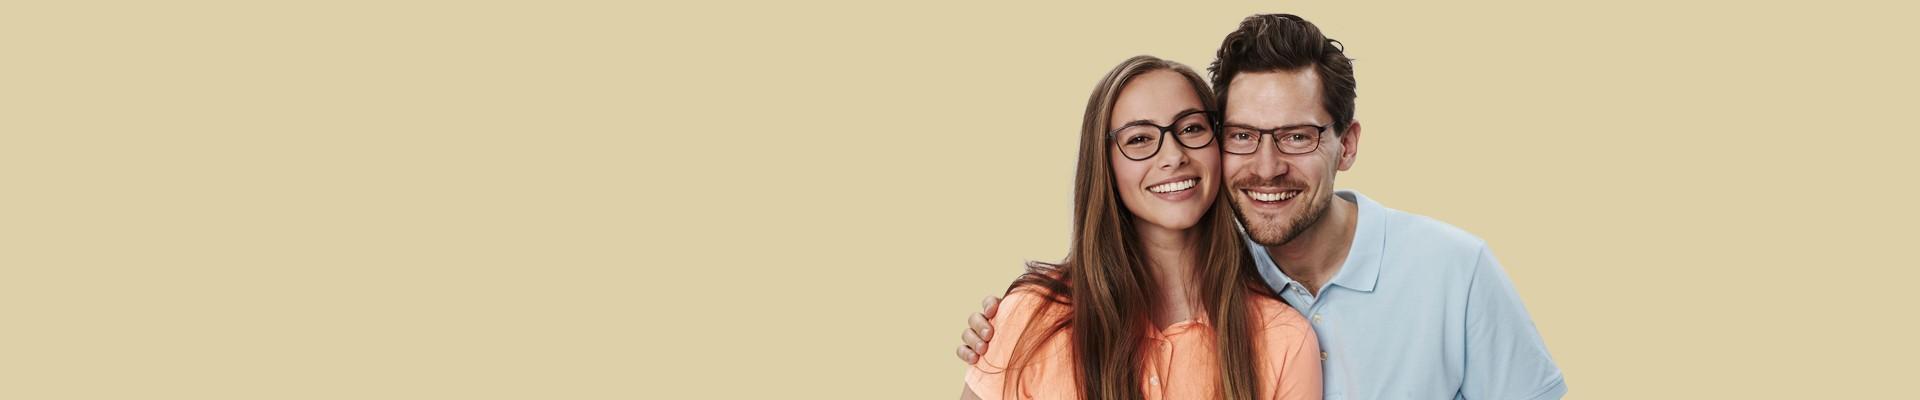 Jual Baju Kaos Couple & Keluarga Model Terbaru - Harga 2018